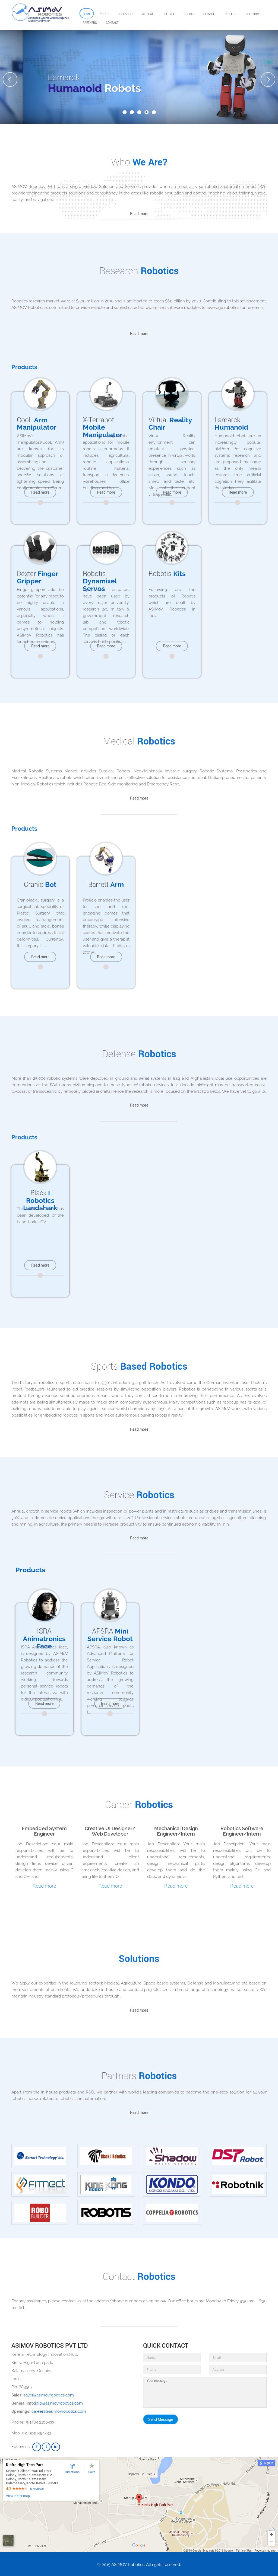 ASIMOV Robotics Competitors, Revenue and Employees - Owler